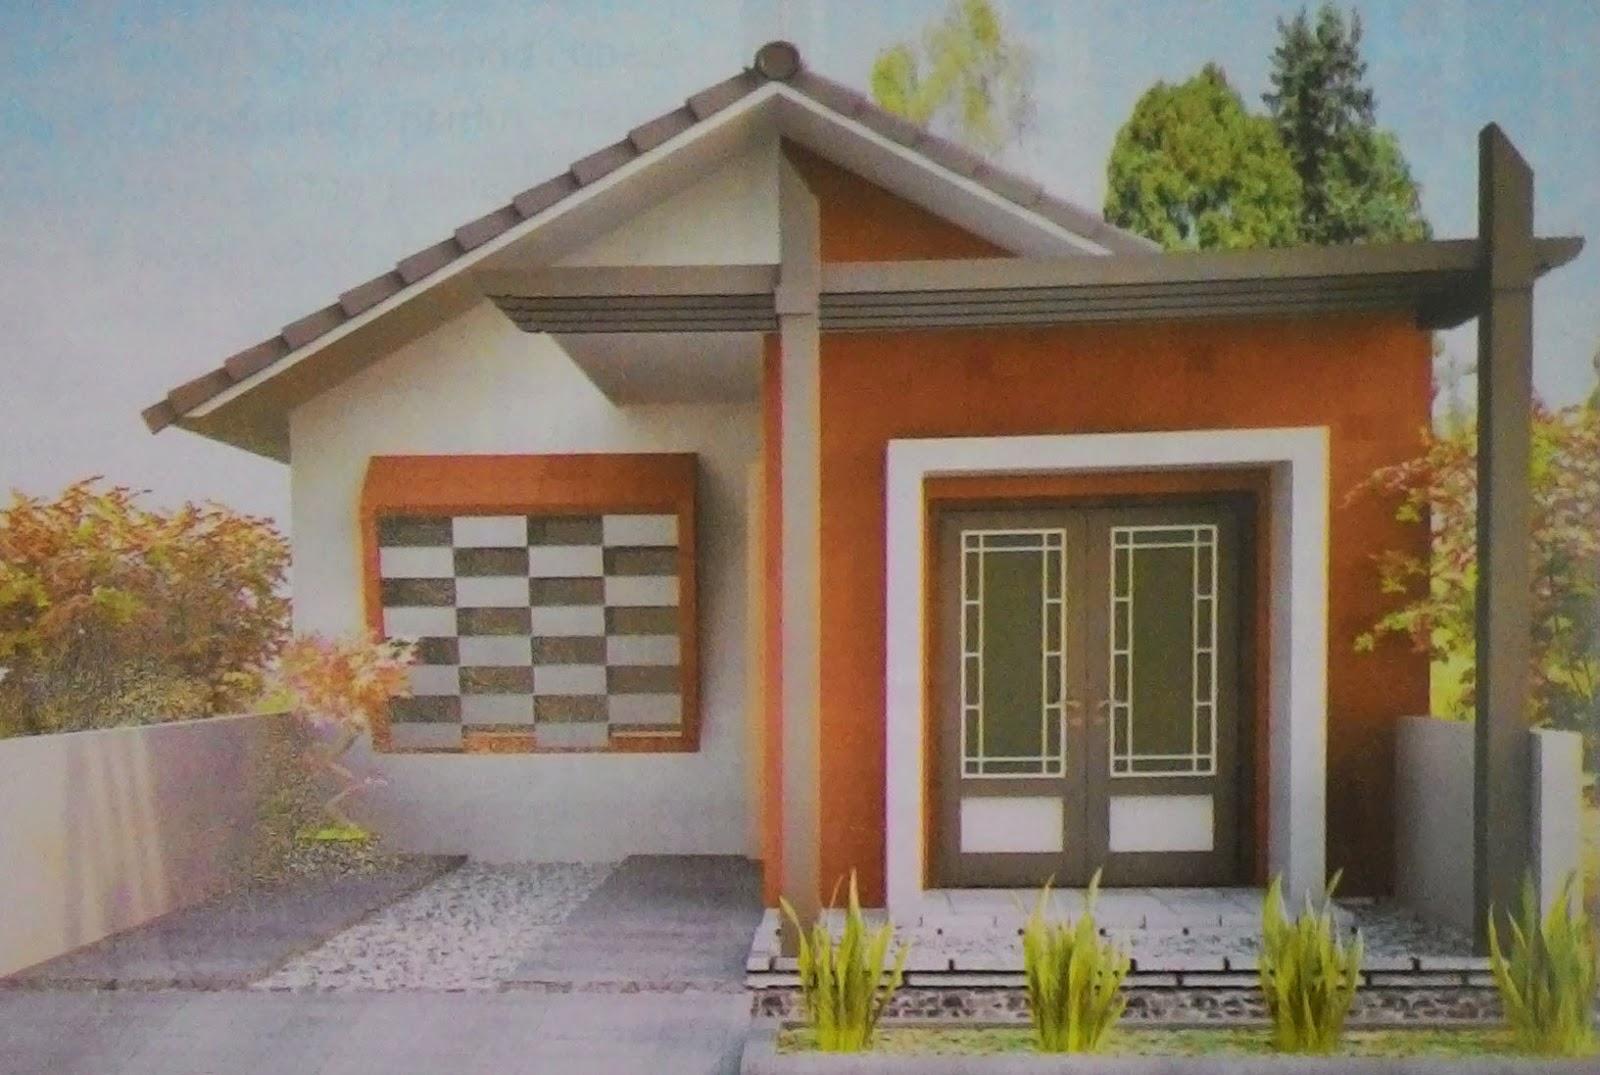 Perhitungan Rumah Minimalis Tipe 36 Dibawah 100 Juta Kumpulan